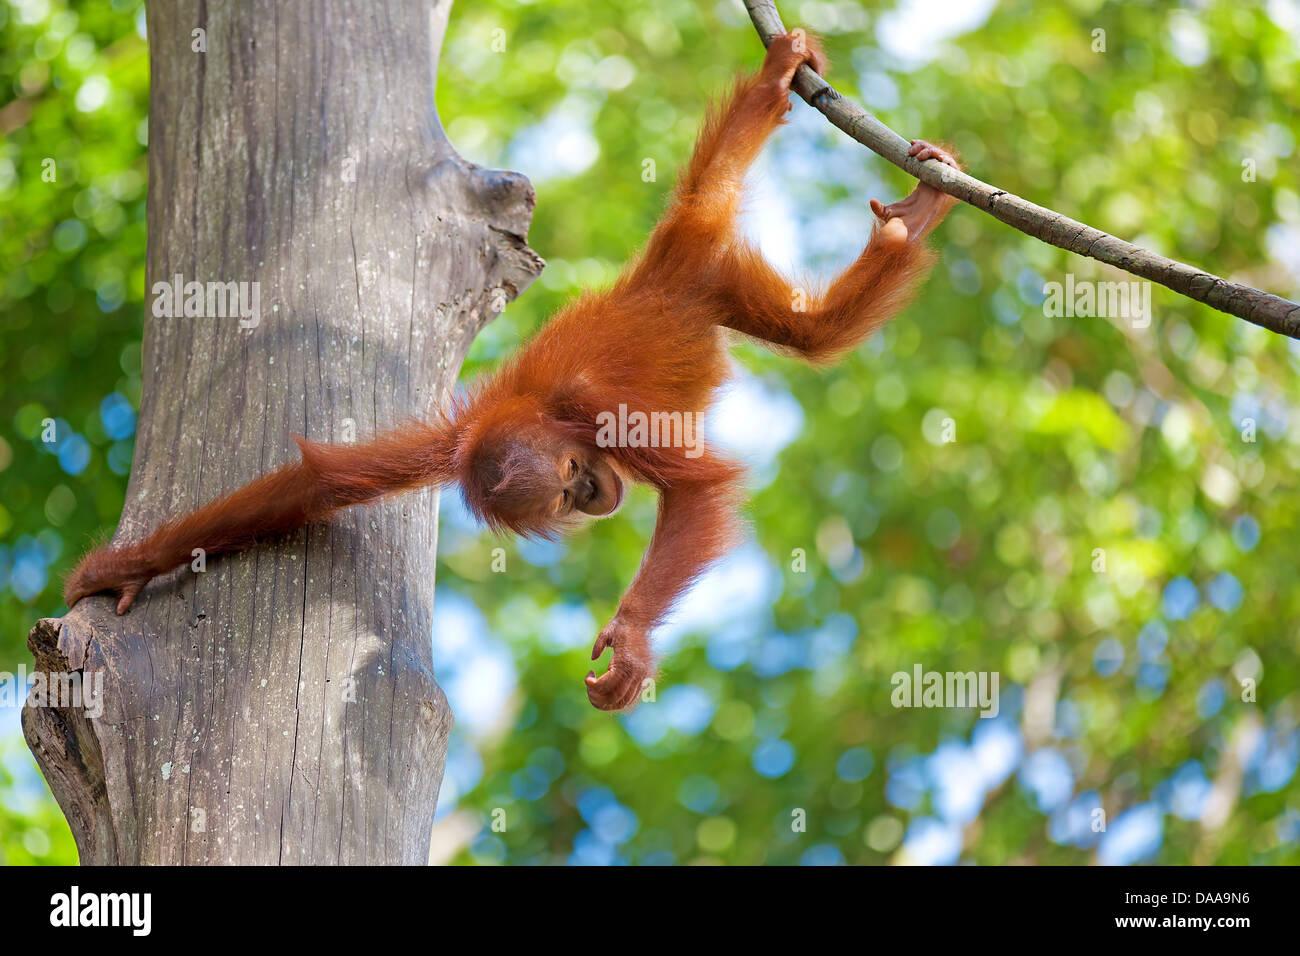 Borneo Orangutan - Stock Image